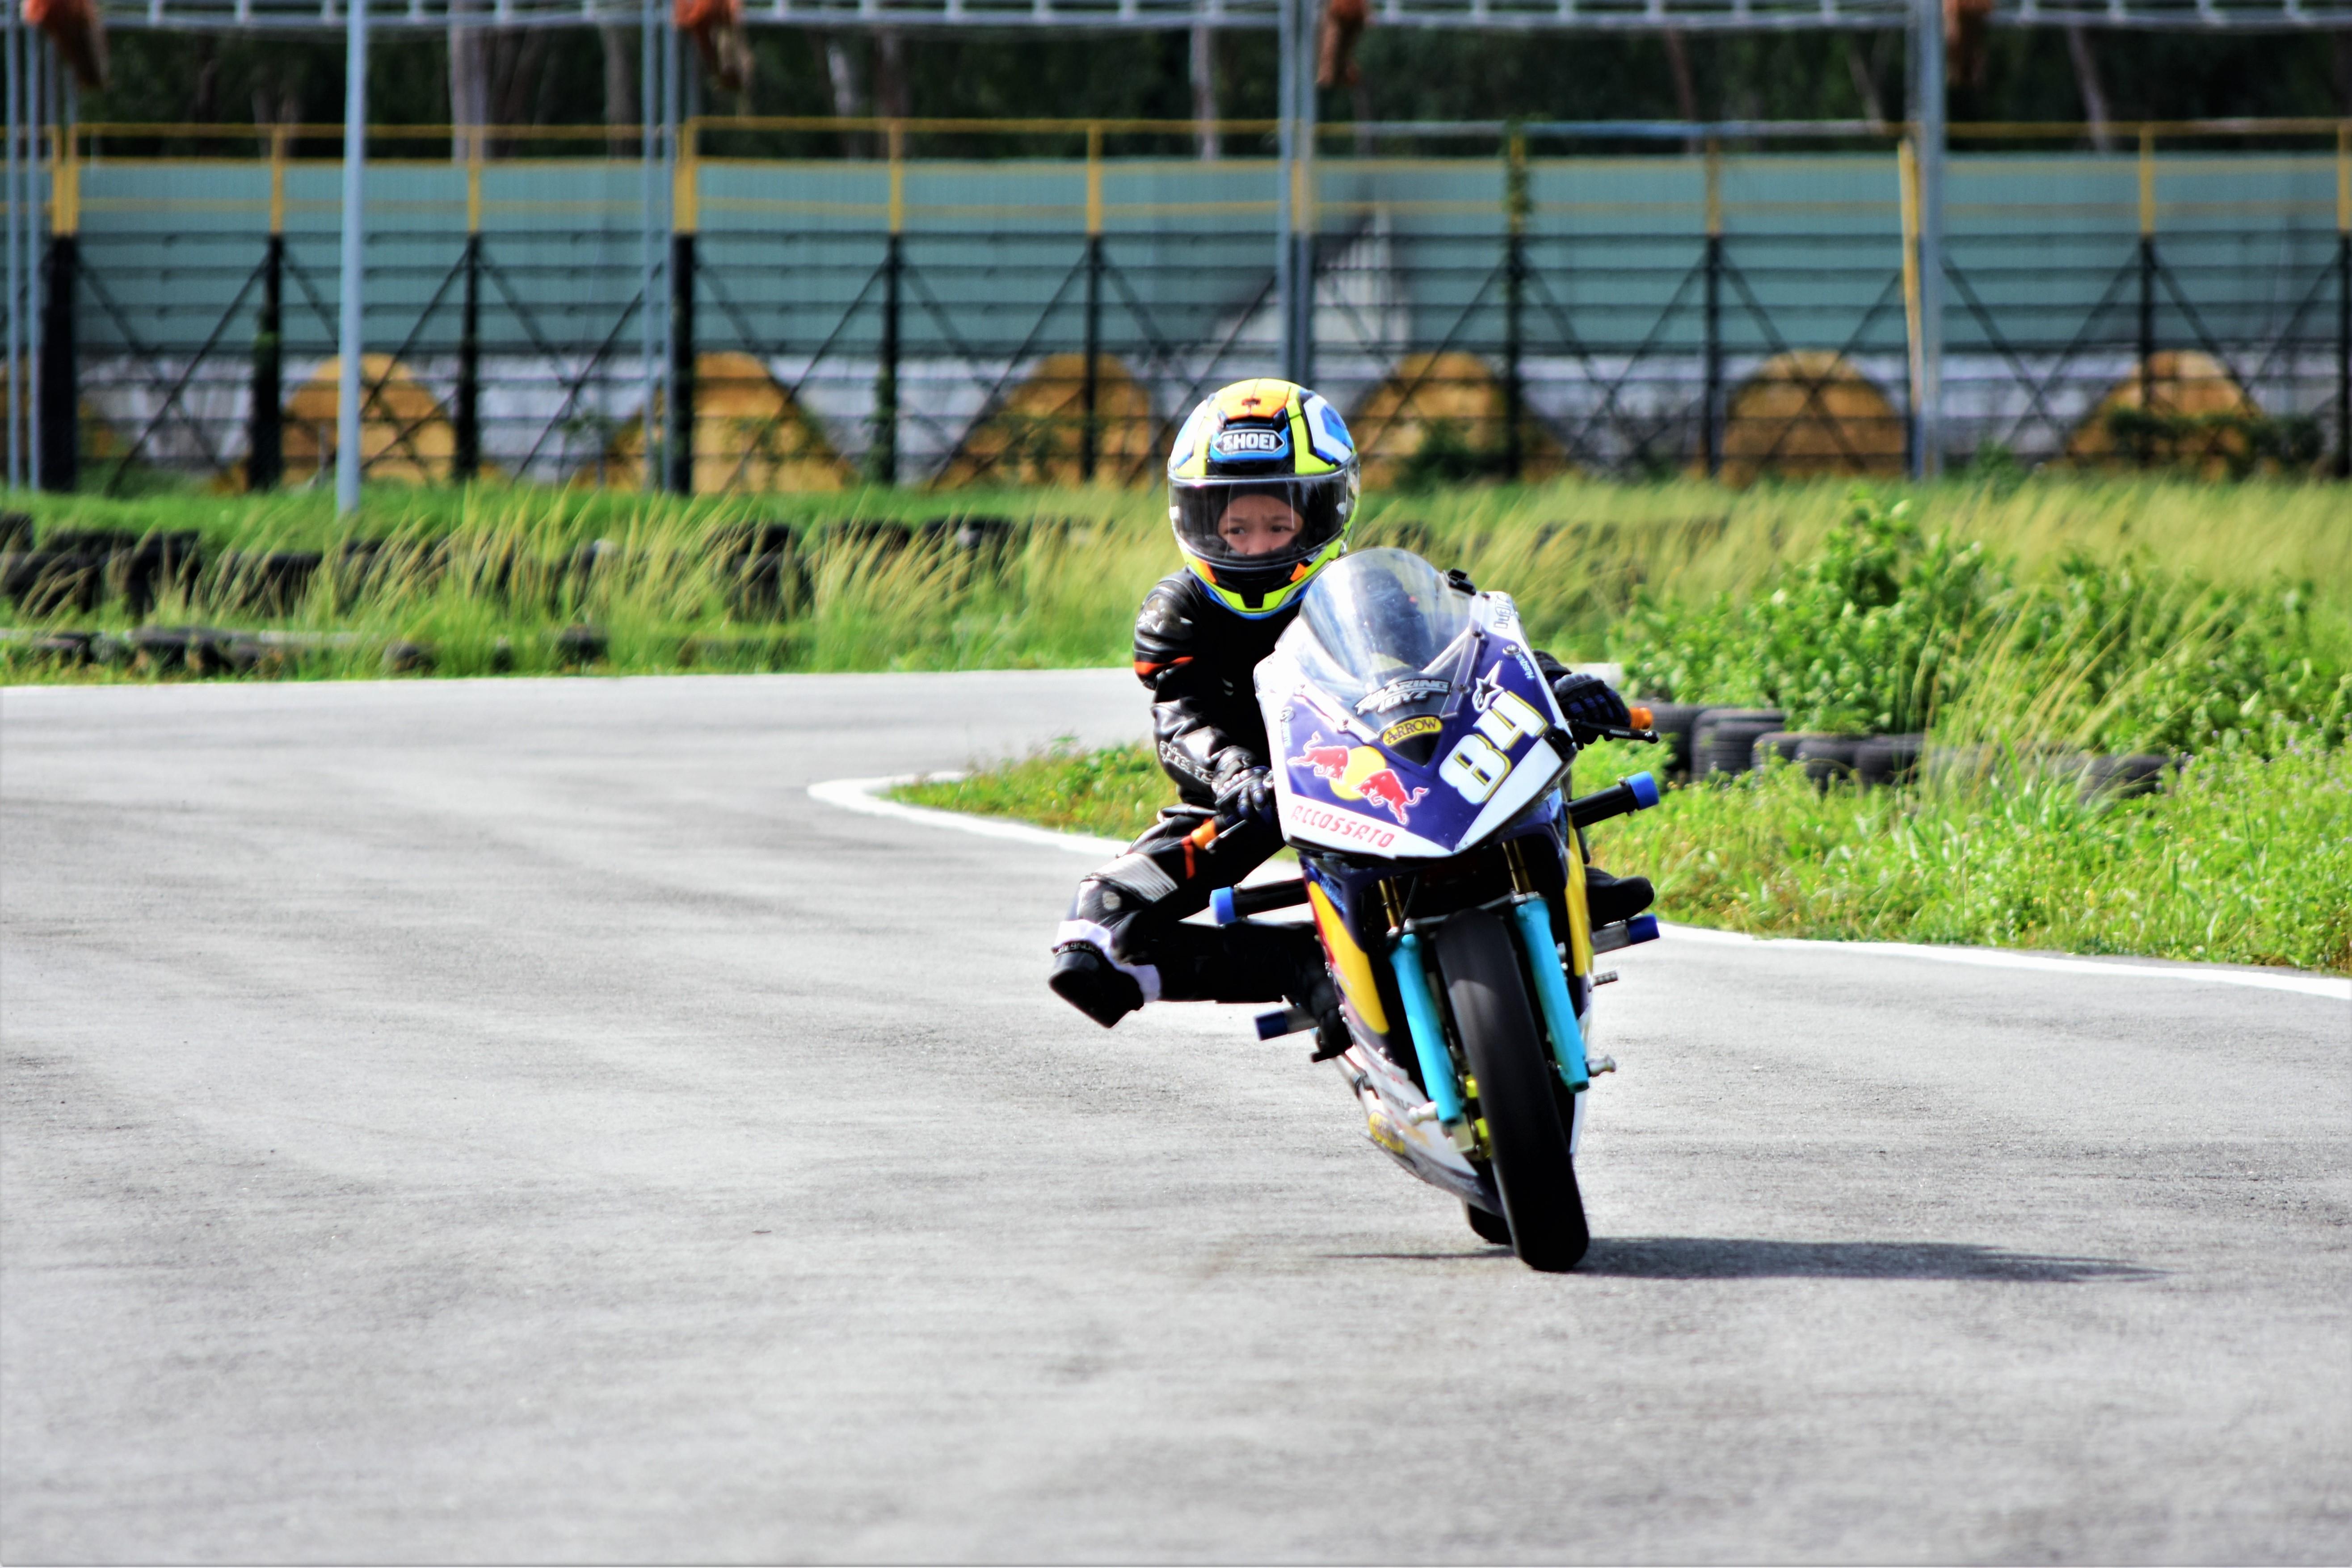 Cau be 7 tuoi uoc mo tro thanh tay dua Moto GP dau tien tai VN hinh anh 13